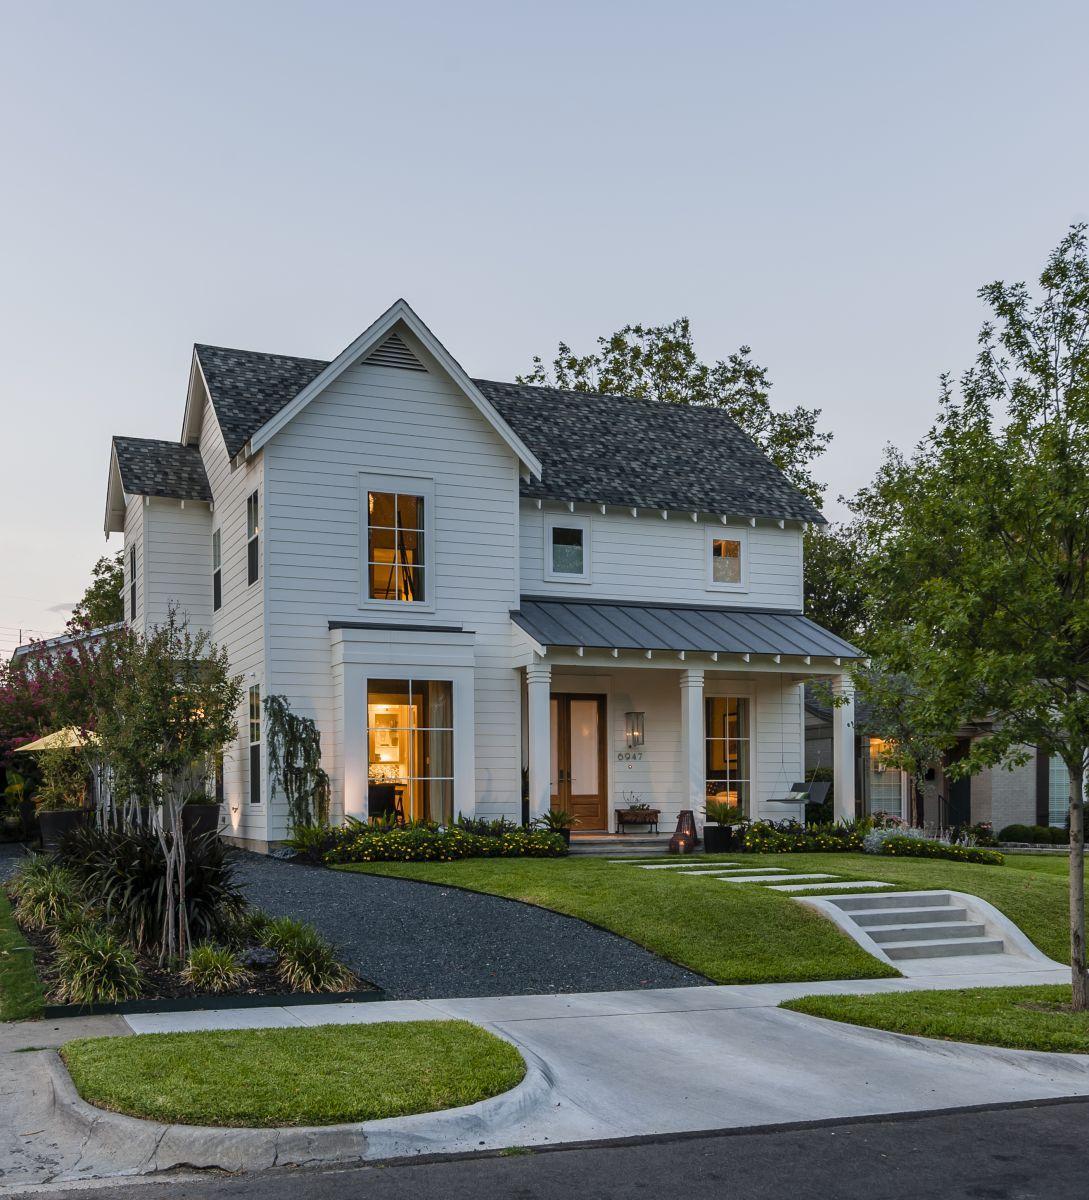 Home Exterior Farmhouse Design Ideas: Pin By Josh Bennett On Home Exterior